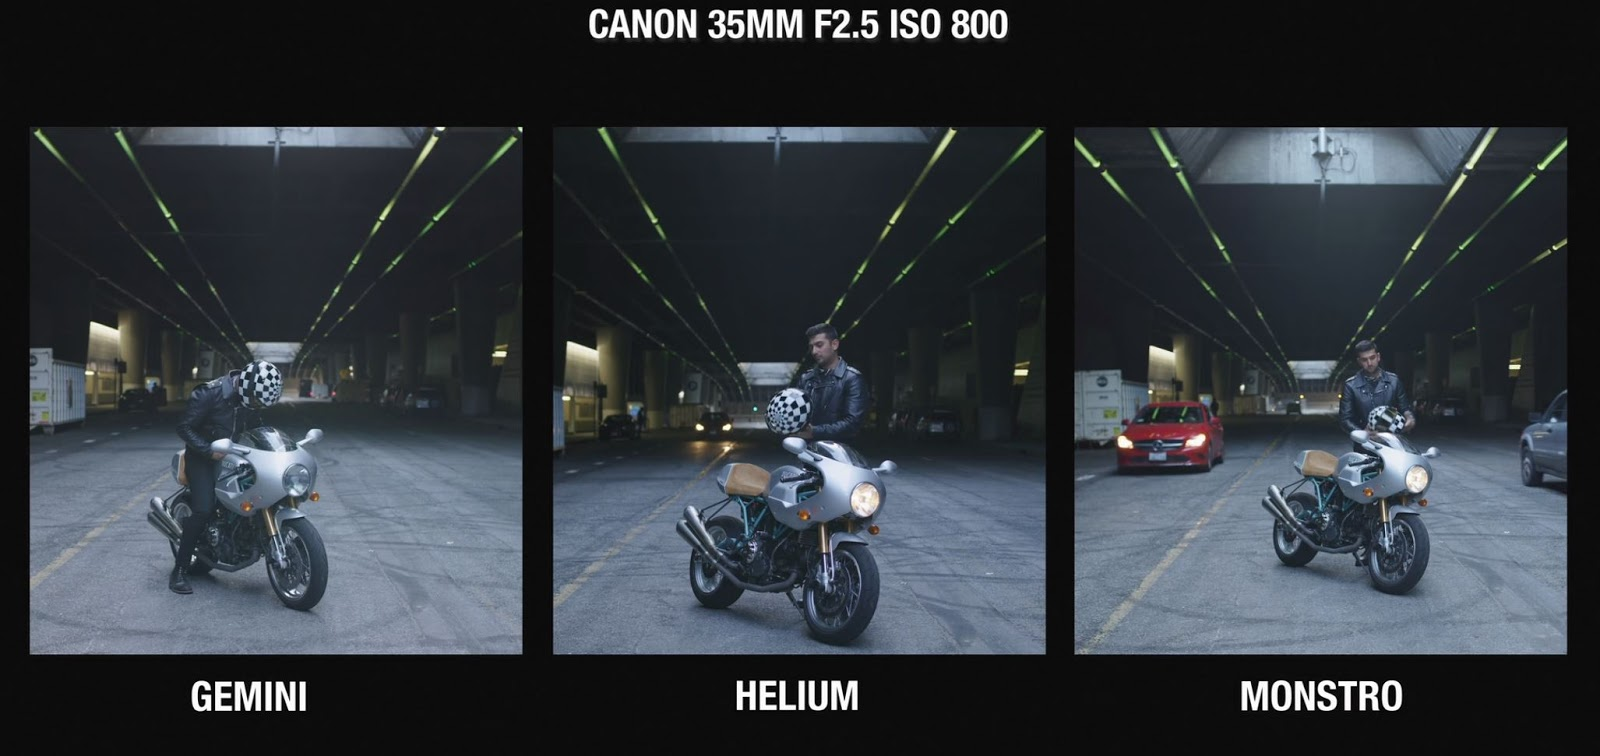 RED Gemini vs Monstro vs Helium side by side Test